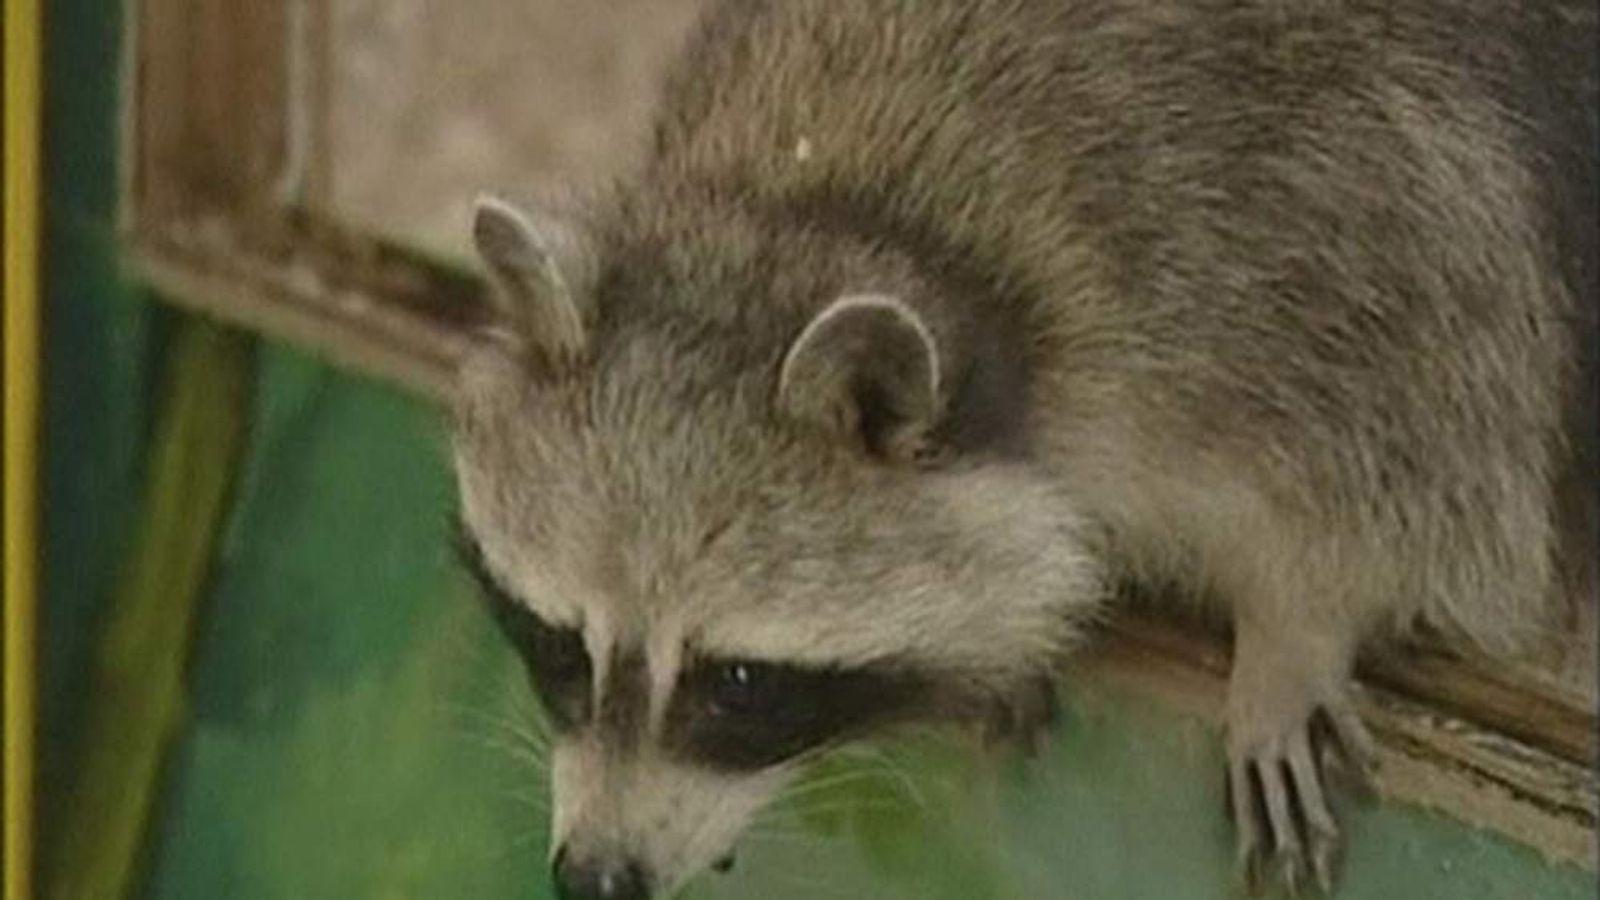 Jemma The Raccoon